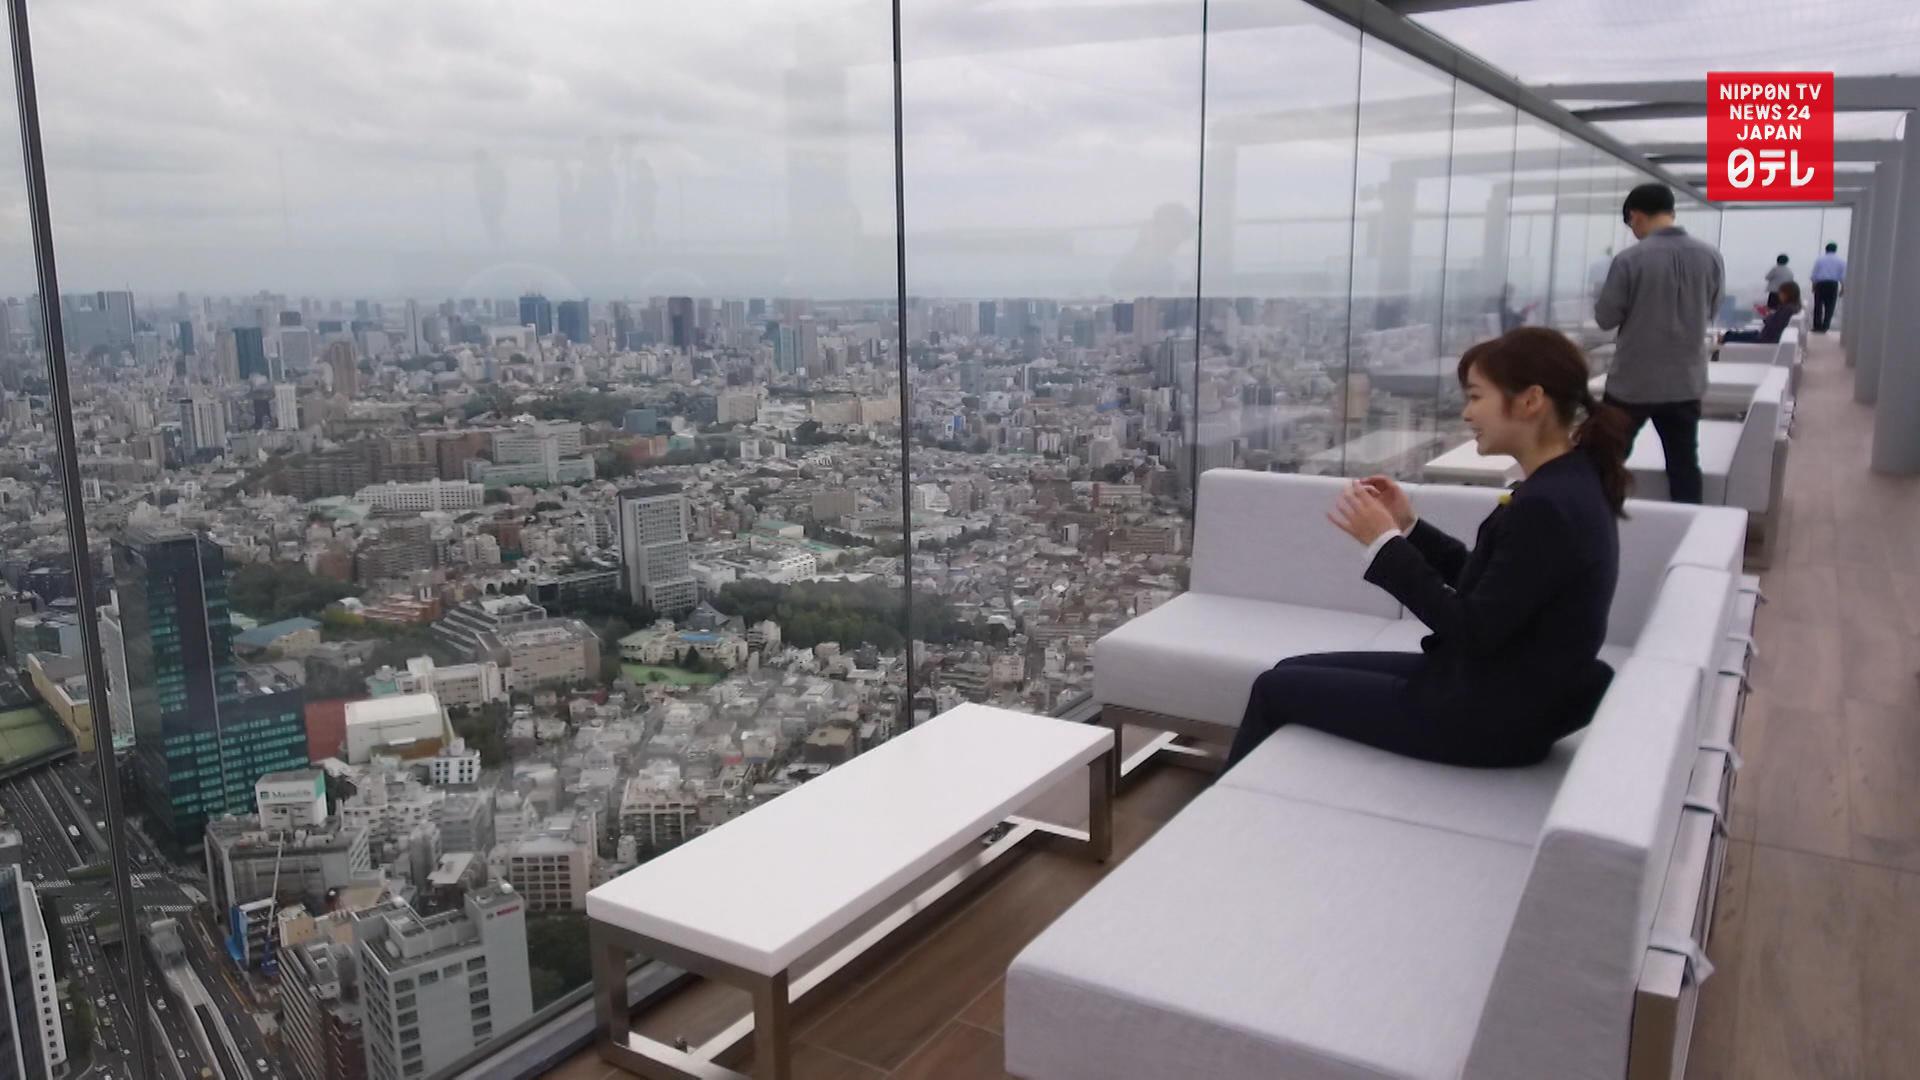 Shibuya's tallest building